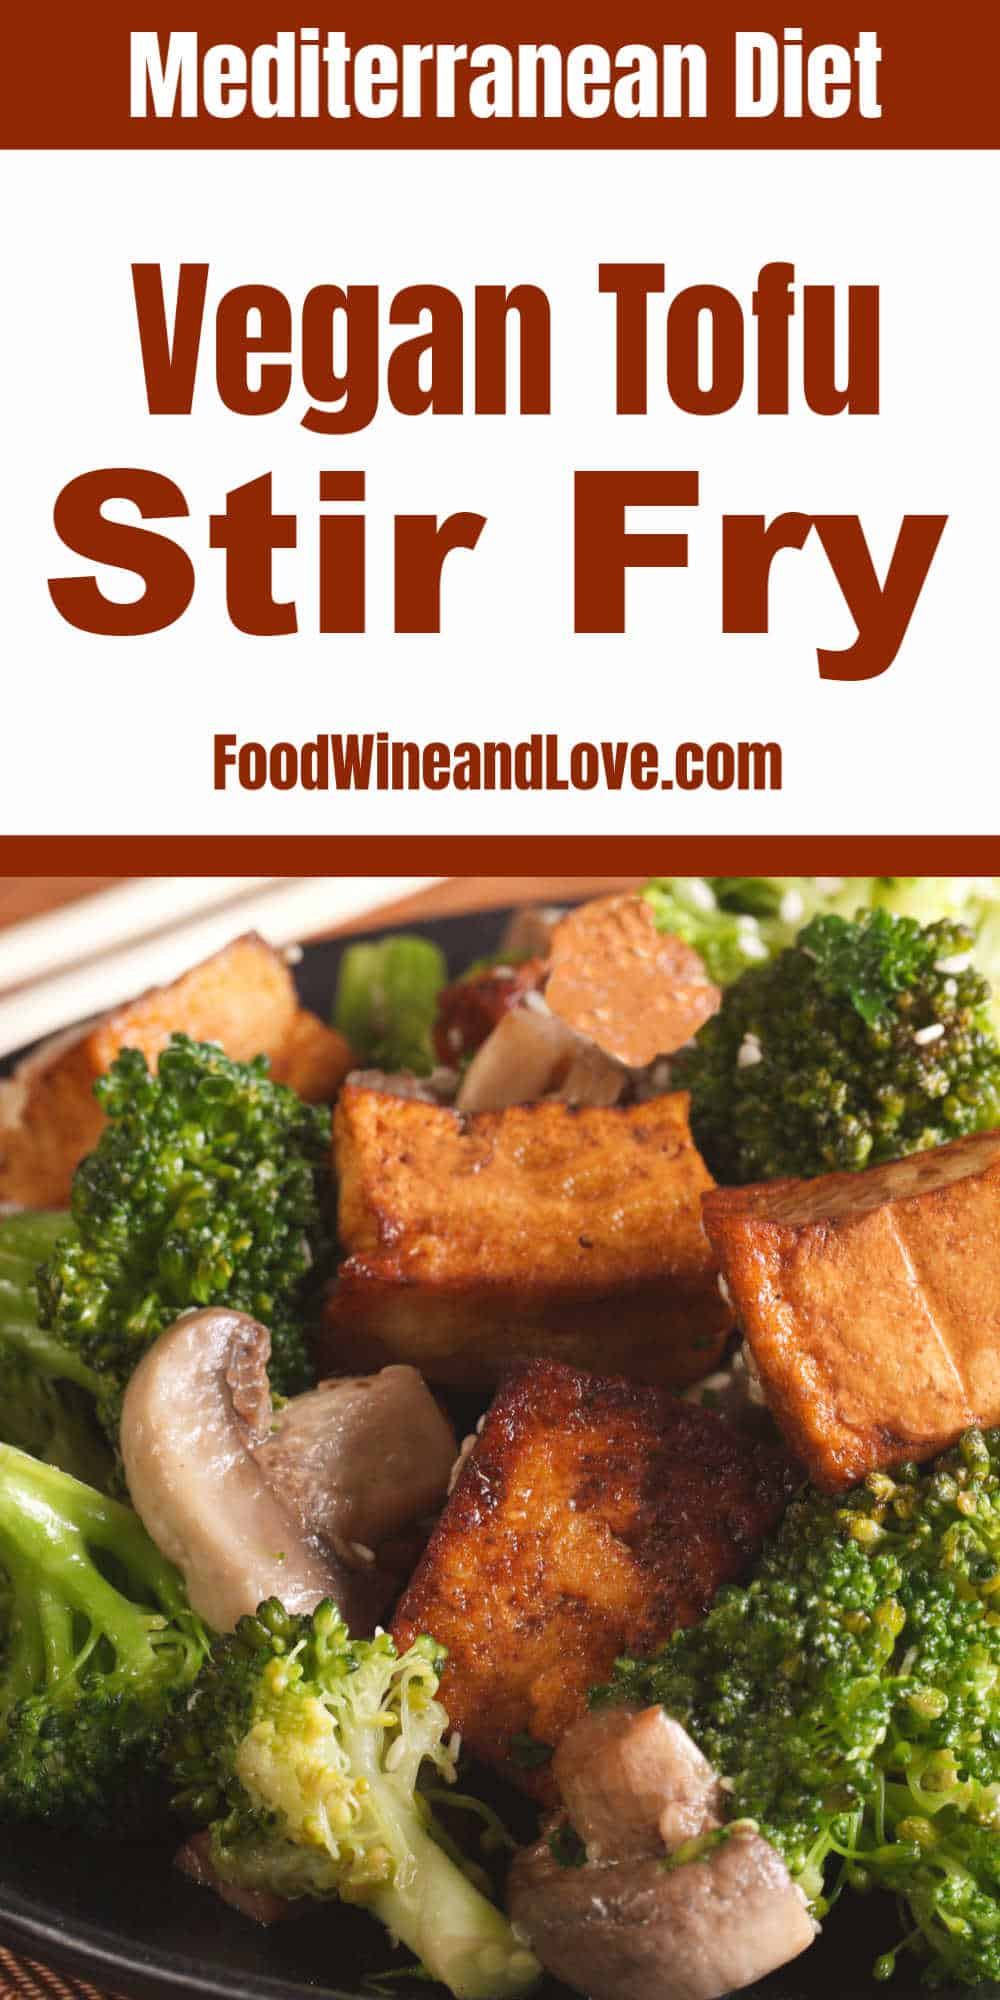 Easy Vegan Tofu and Broccoli Stir Fry